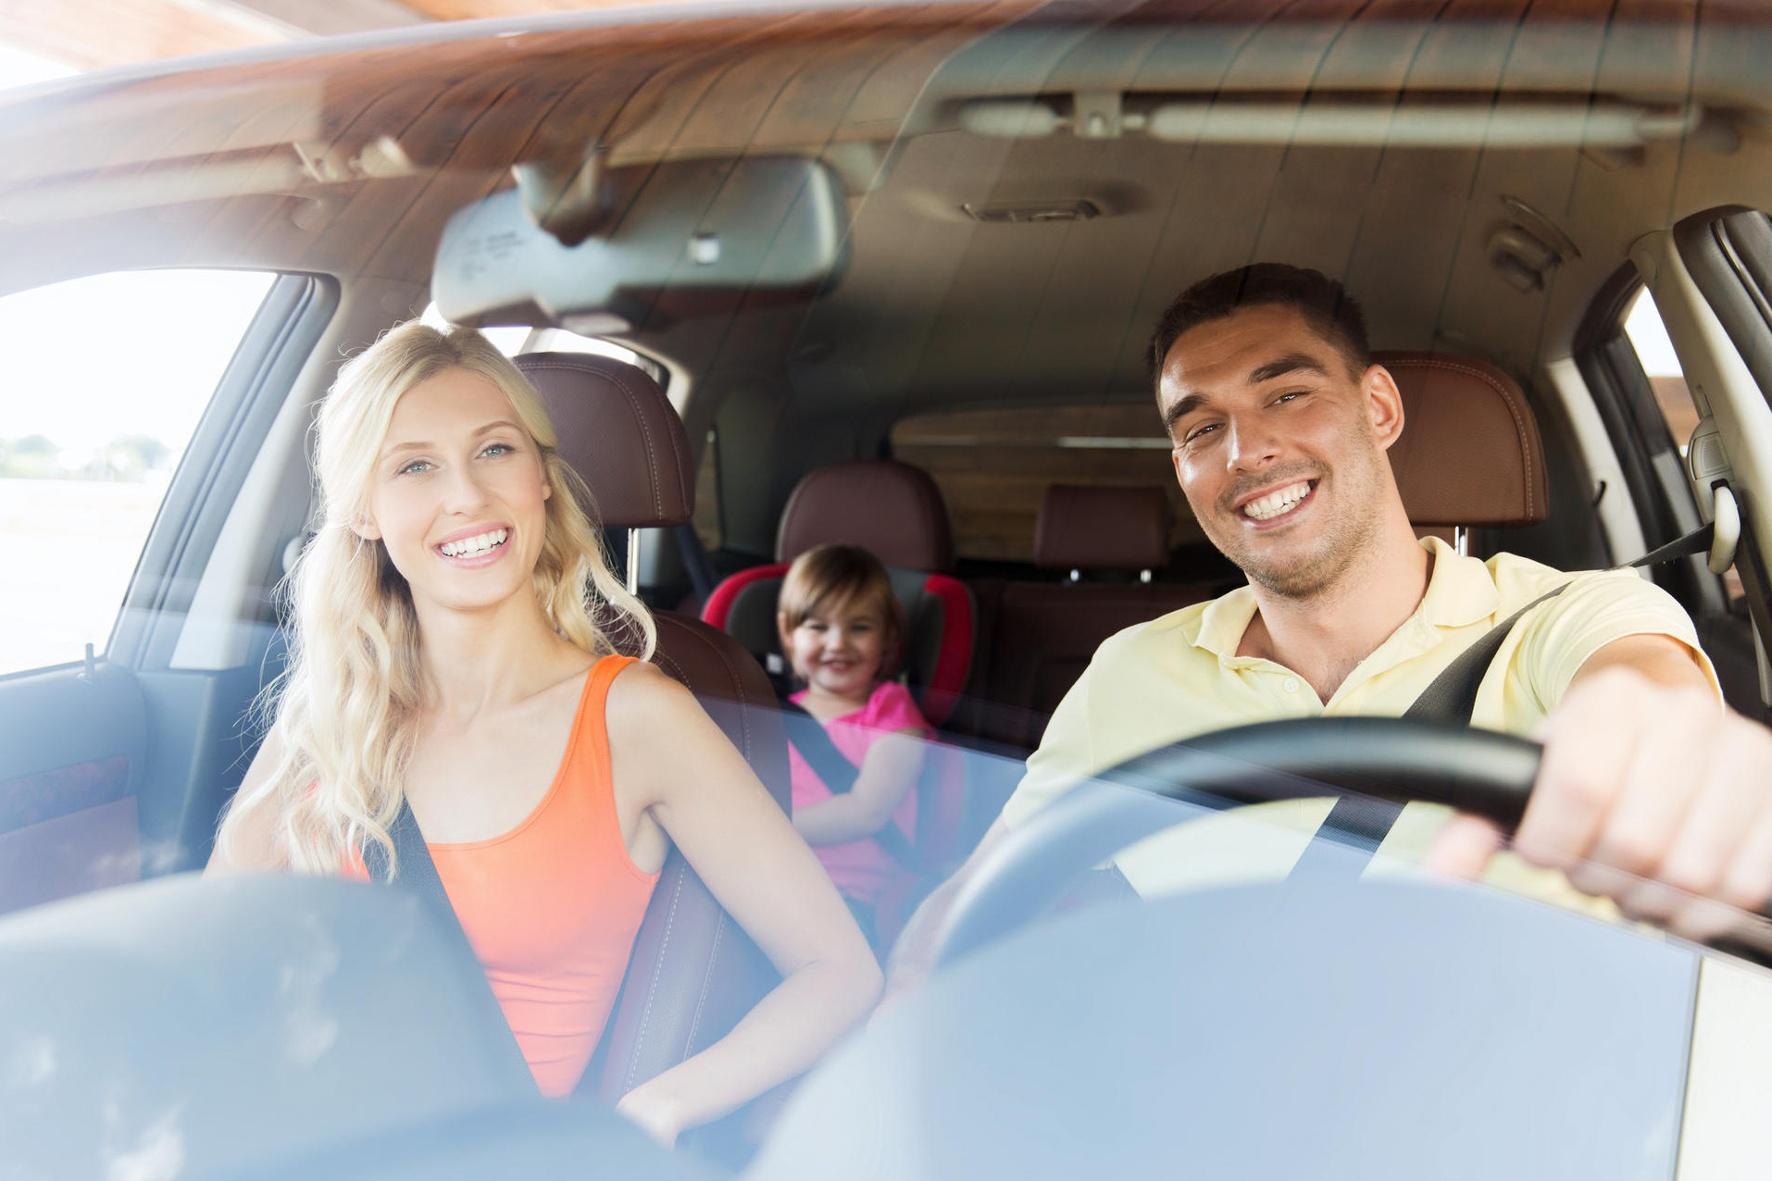 Fahrverbote spalten die Gesellschaft